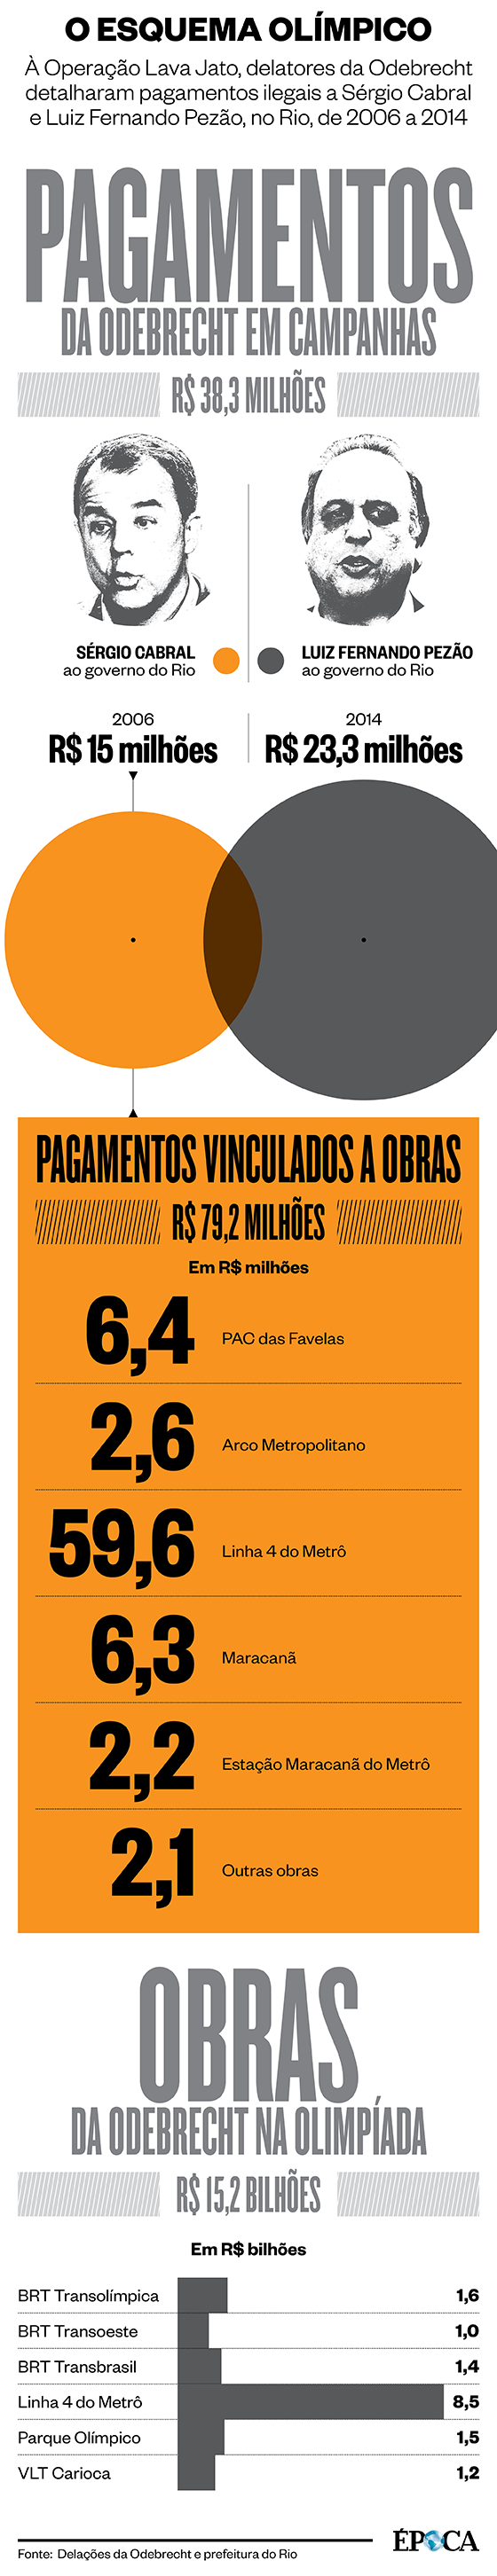 Os pagamentos da Odebrecht a Sérgio Cabral (Foto: ÉPOCA)